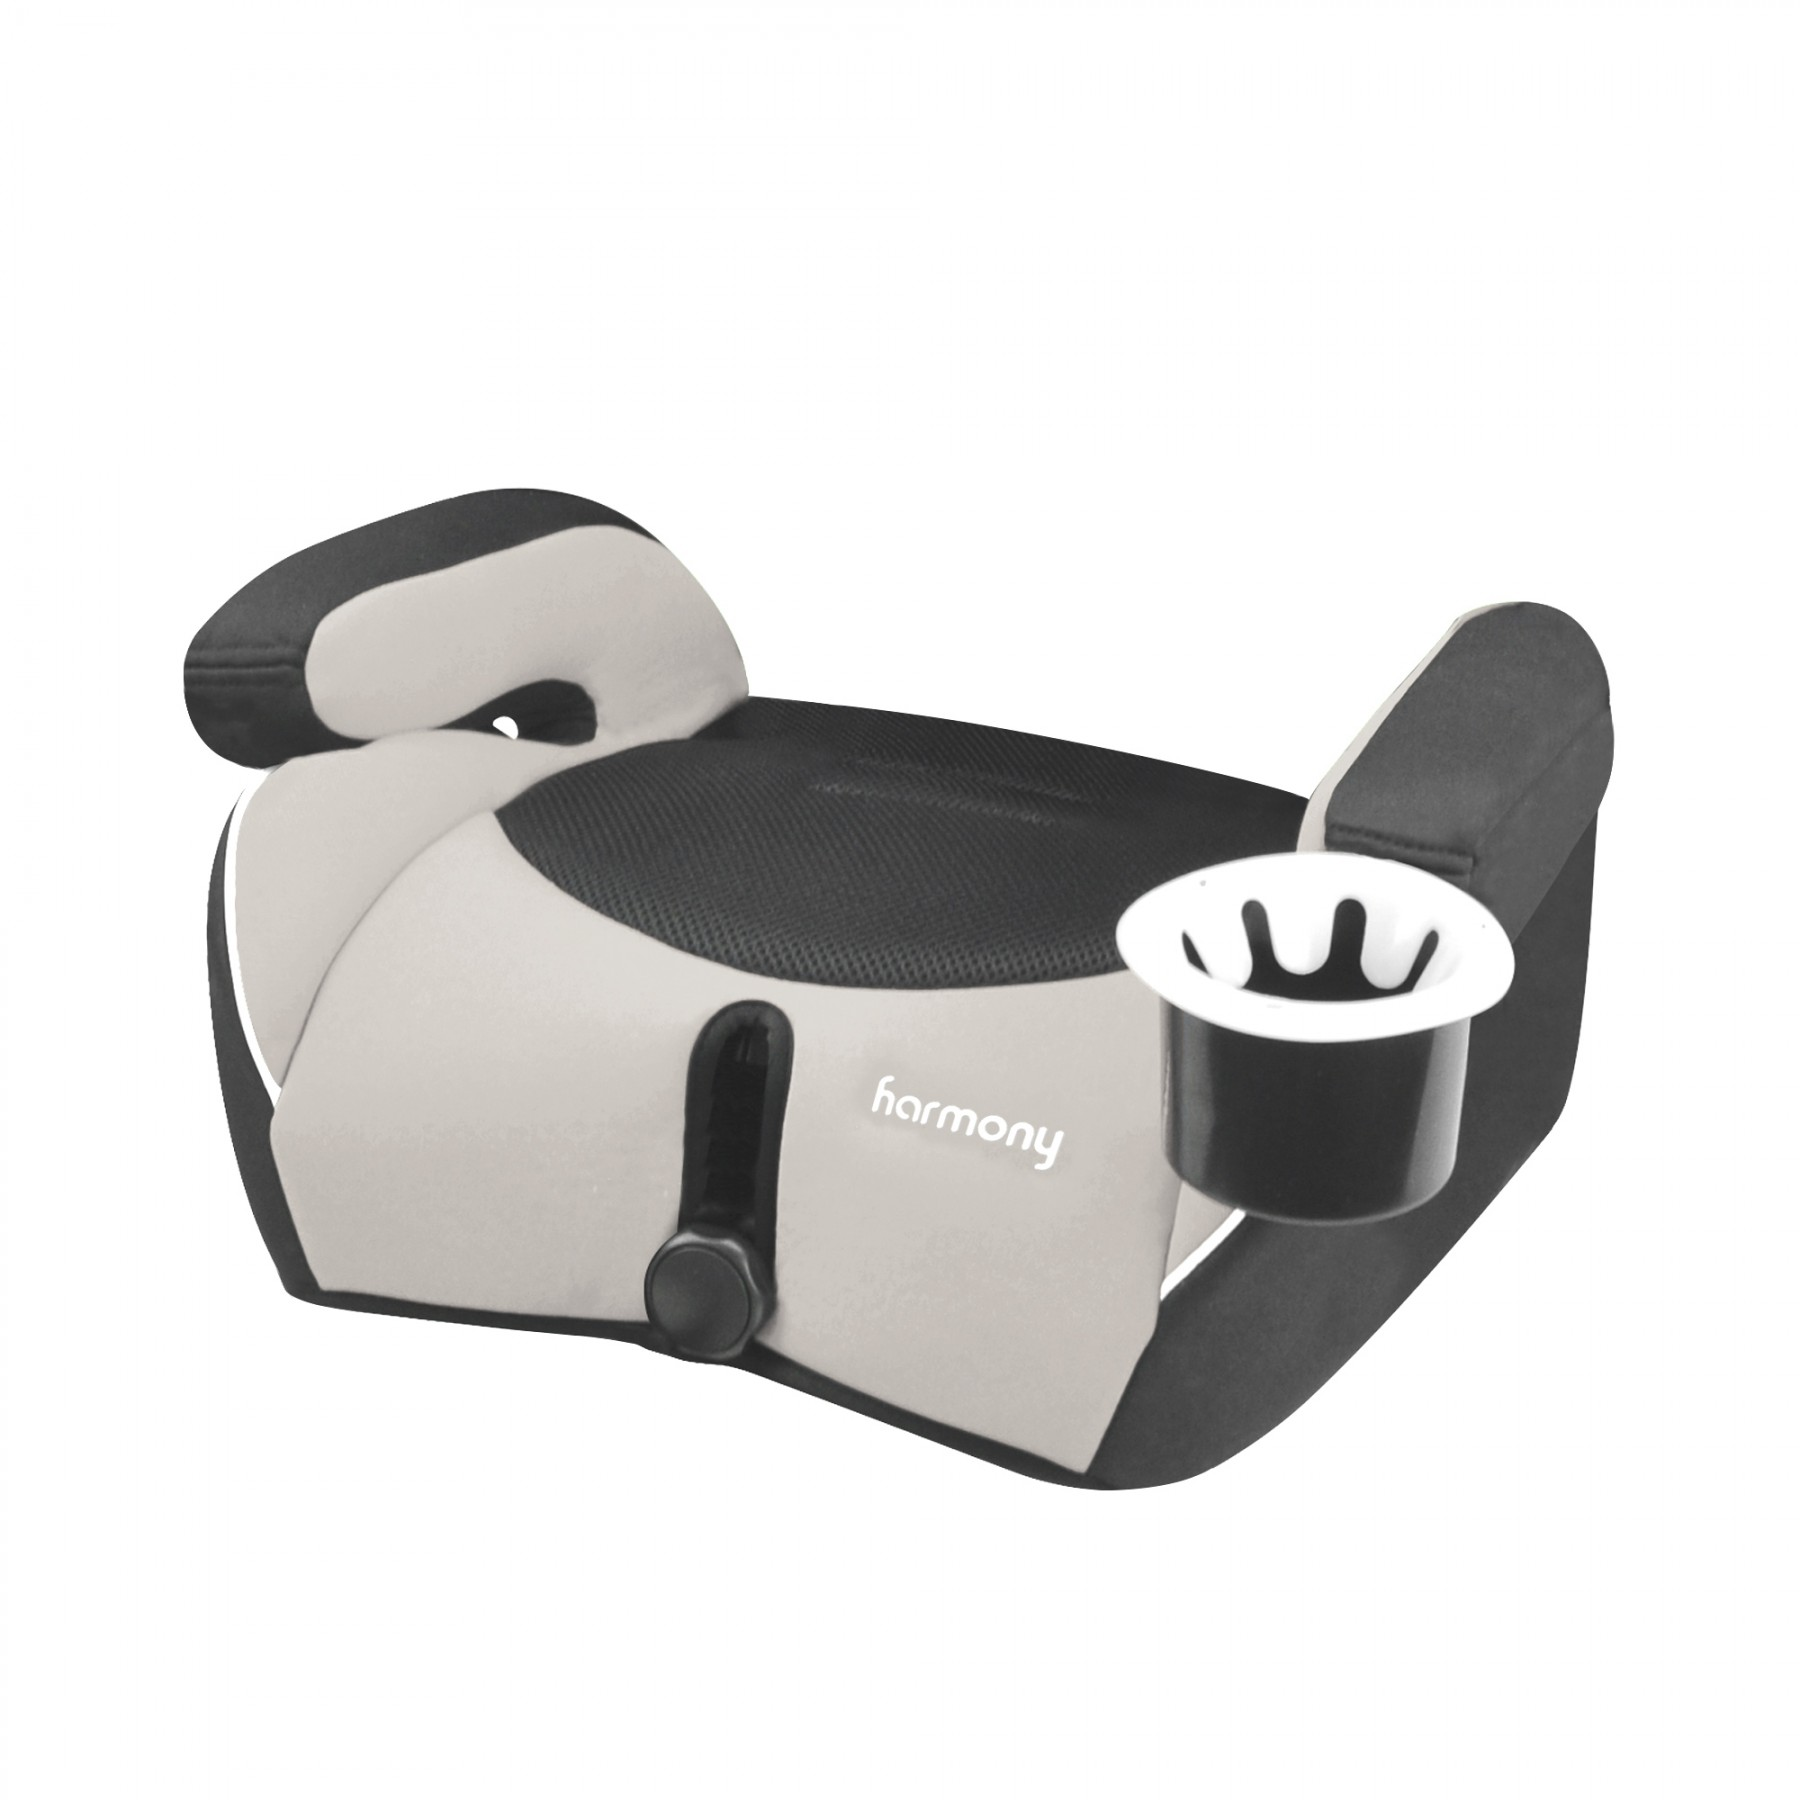 Defender 360° 3-in-1 Combination Deluxe Car Seat - Grey/Black